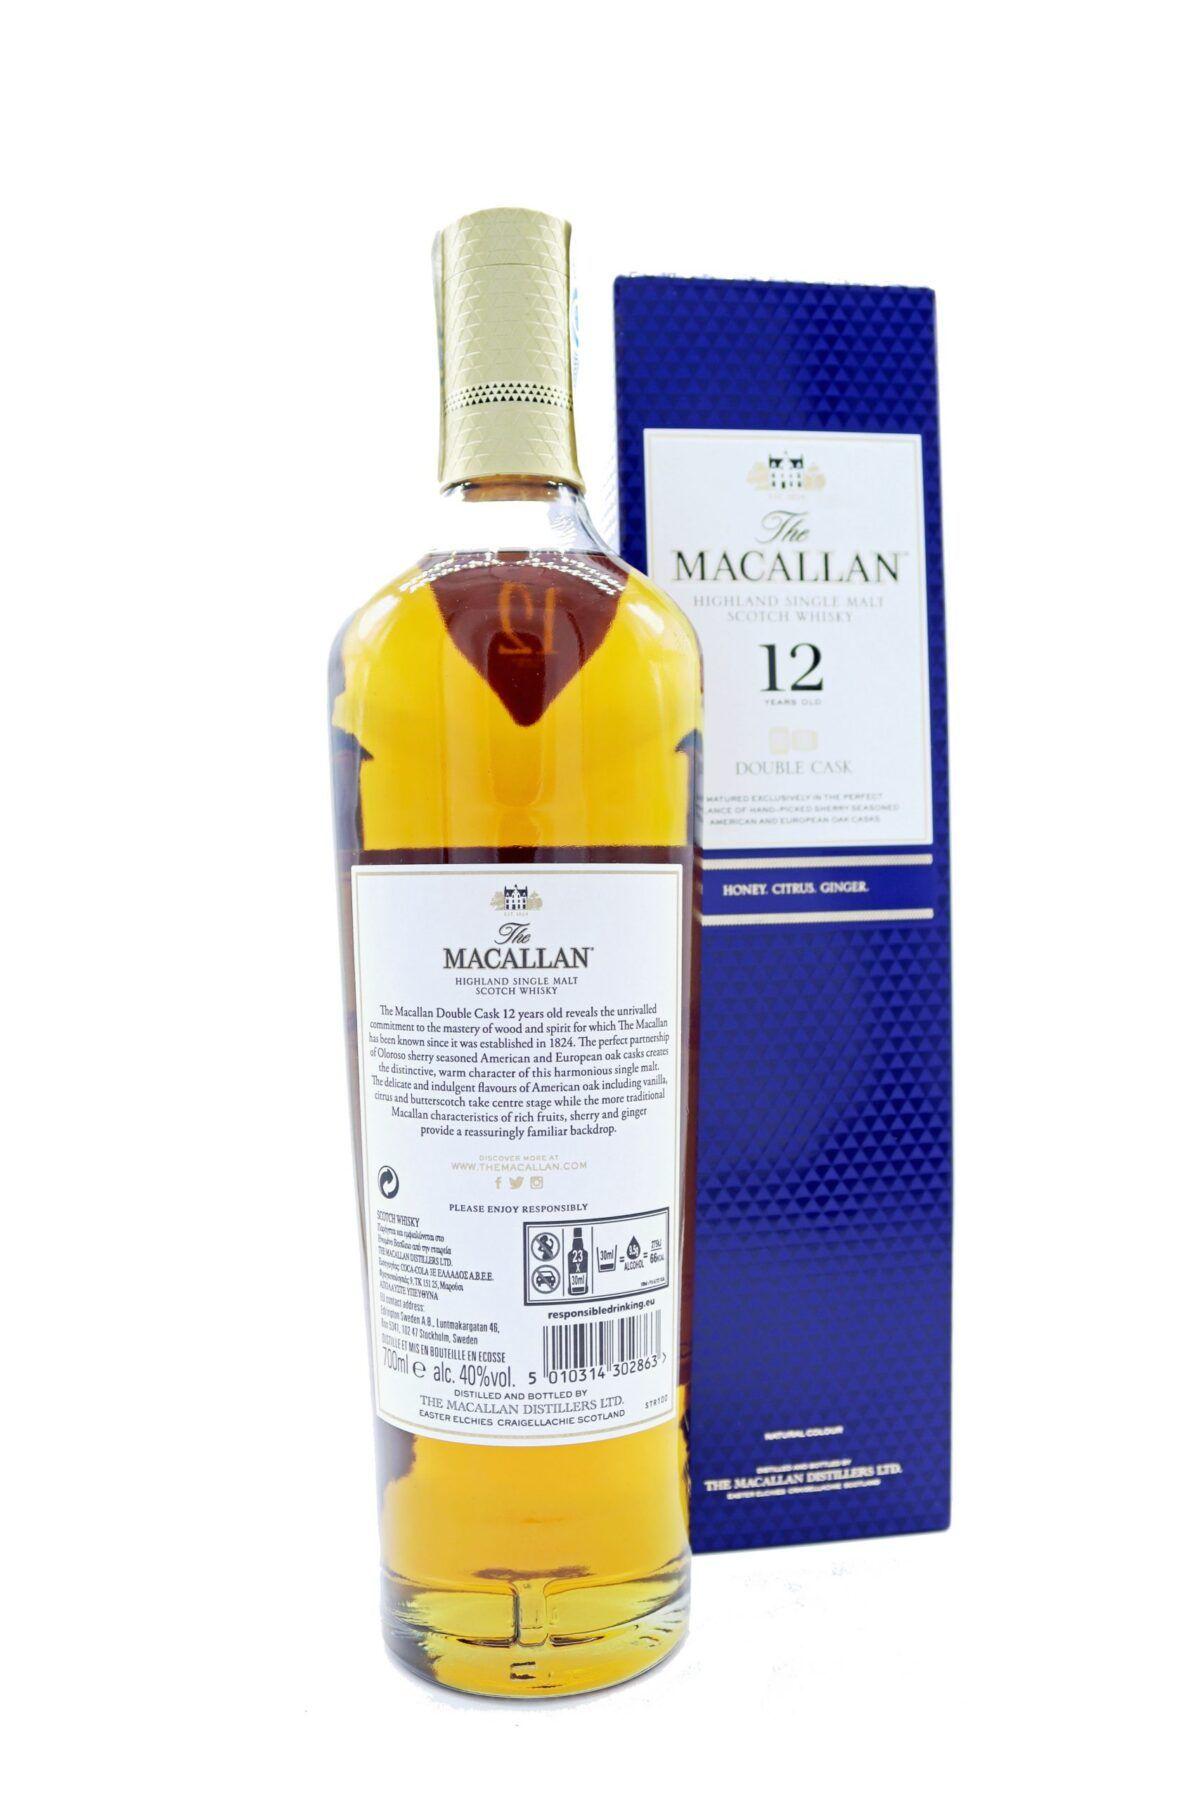 MACALLAM DOUBLE CASK 70 CL Bodega Montferry